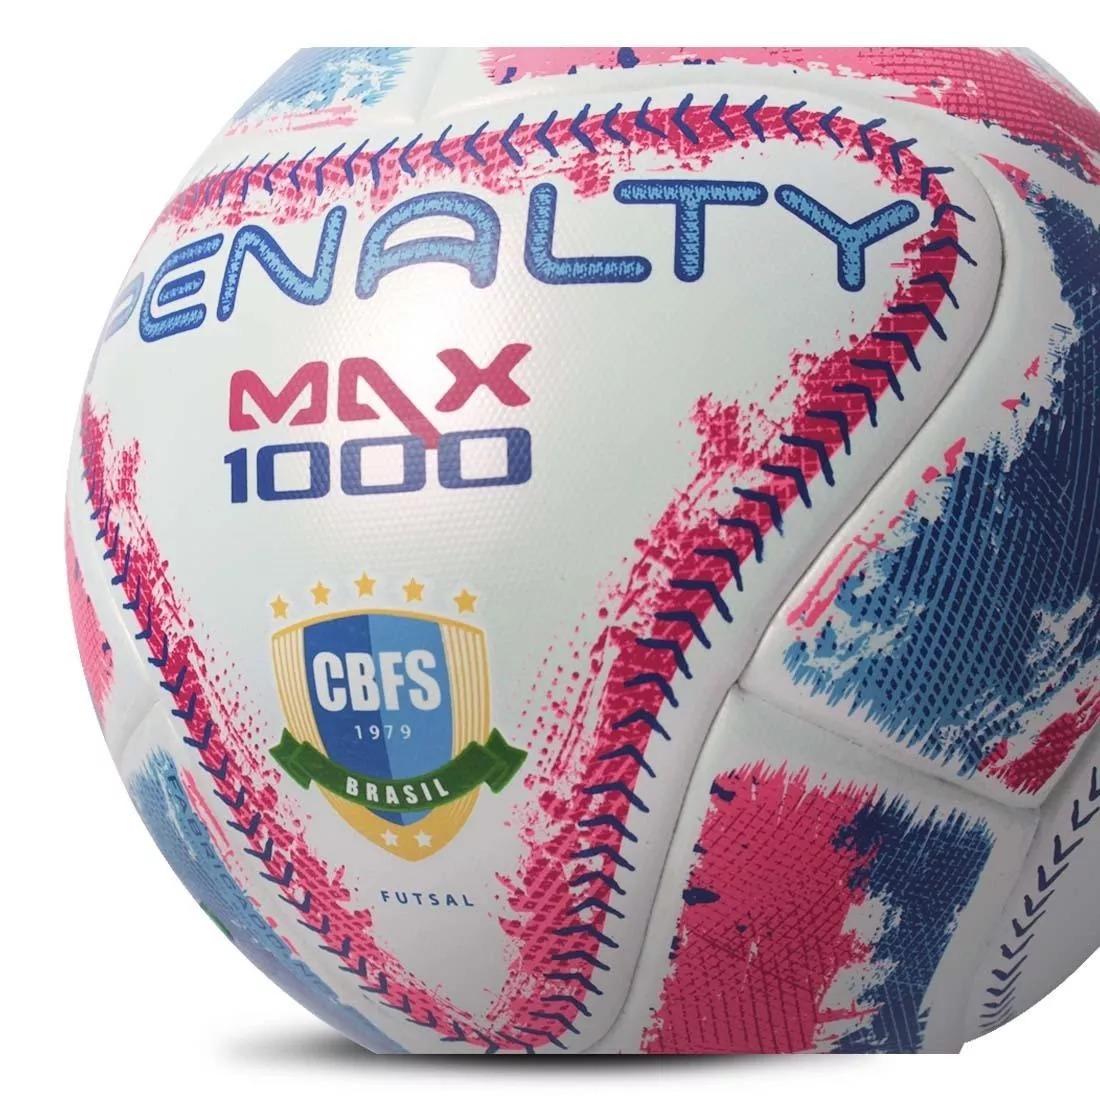 3ff5ac35b96a7 bola futsal penalty max 1000 pró 7 - profissional - fifa. Carregando zoom.